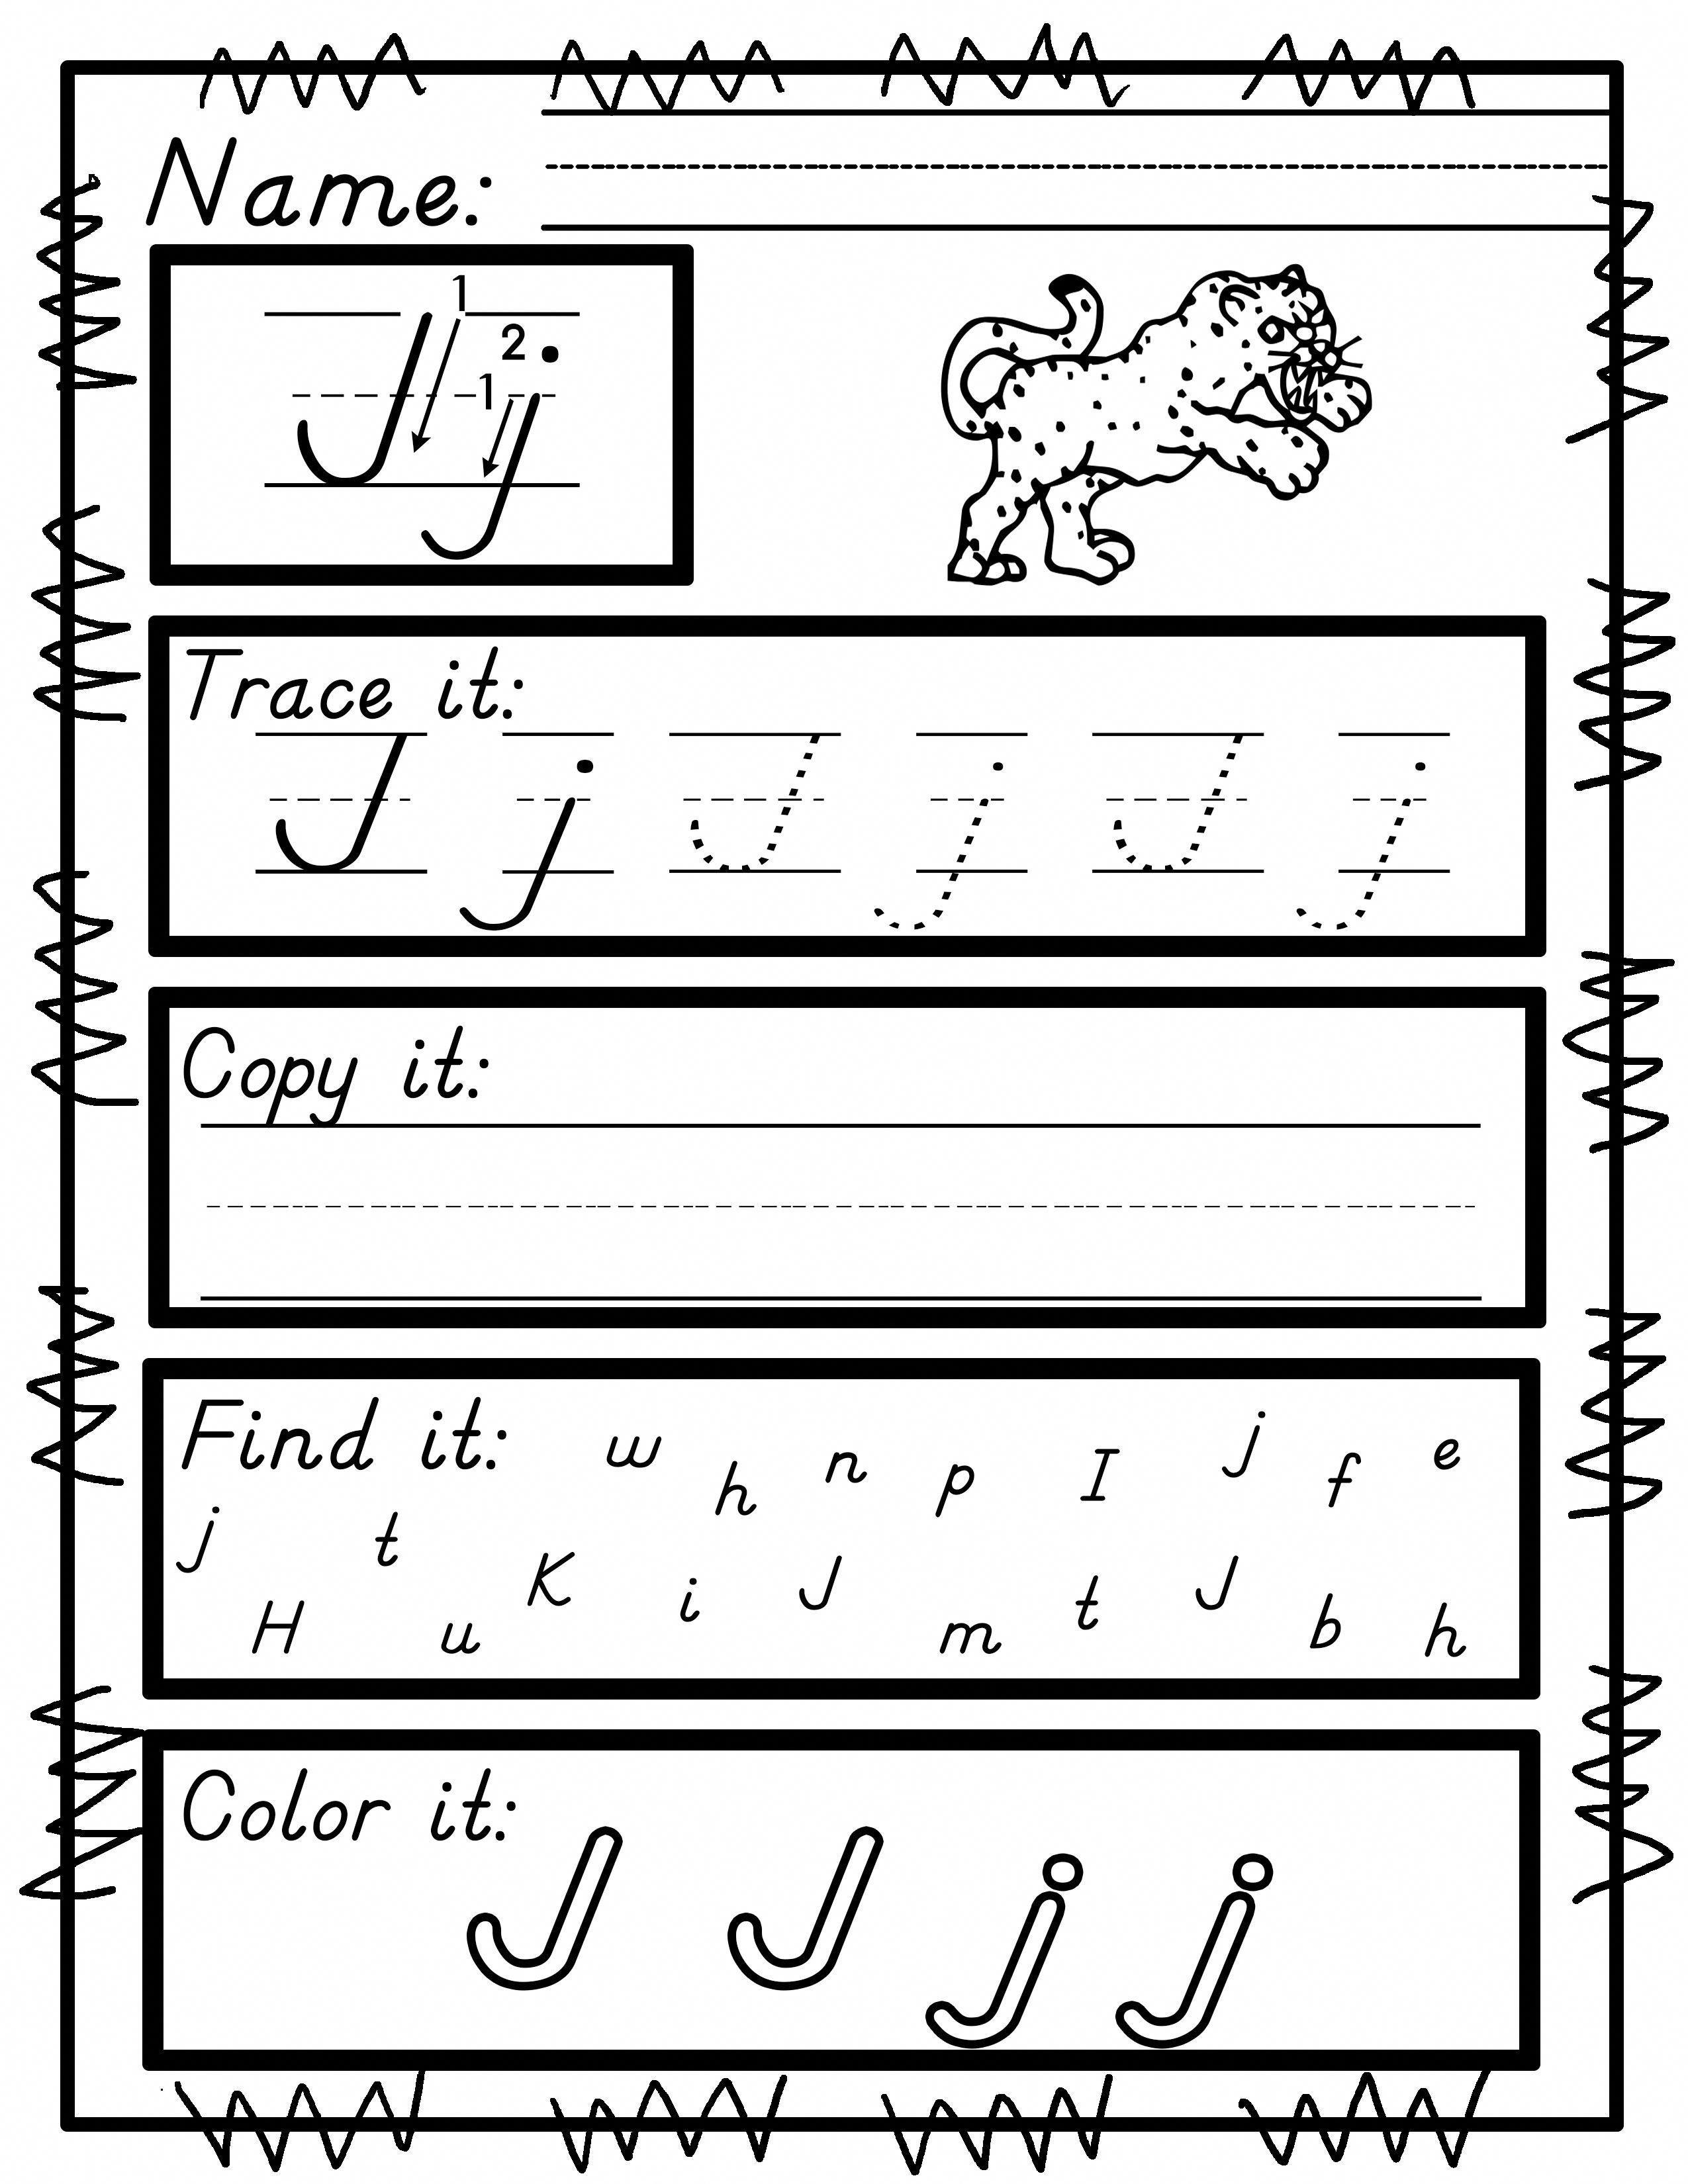 Practice Handwriting Handwritingimprovement